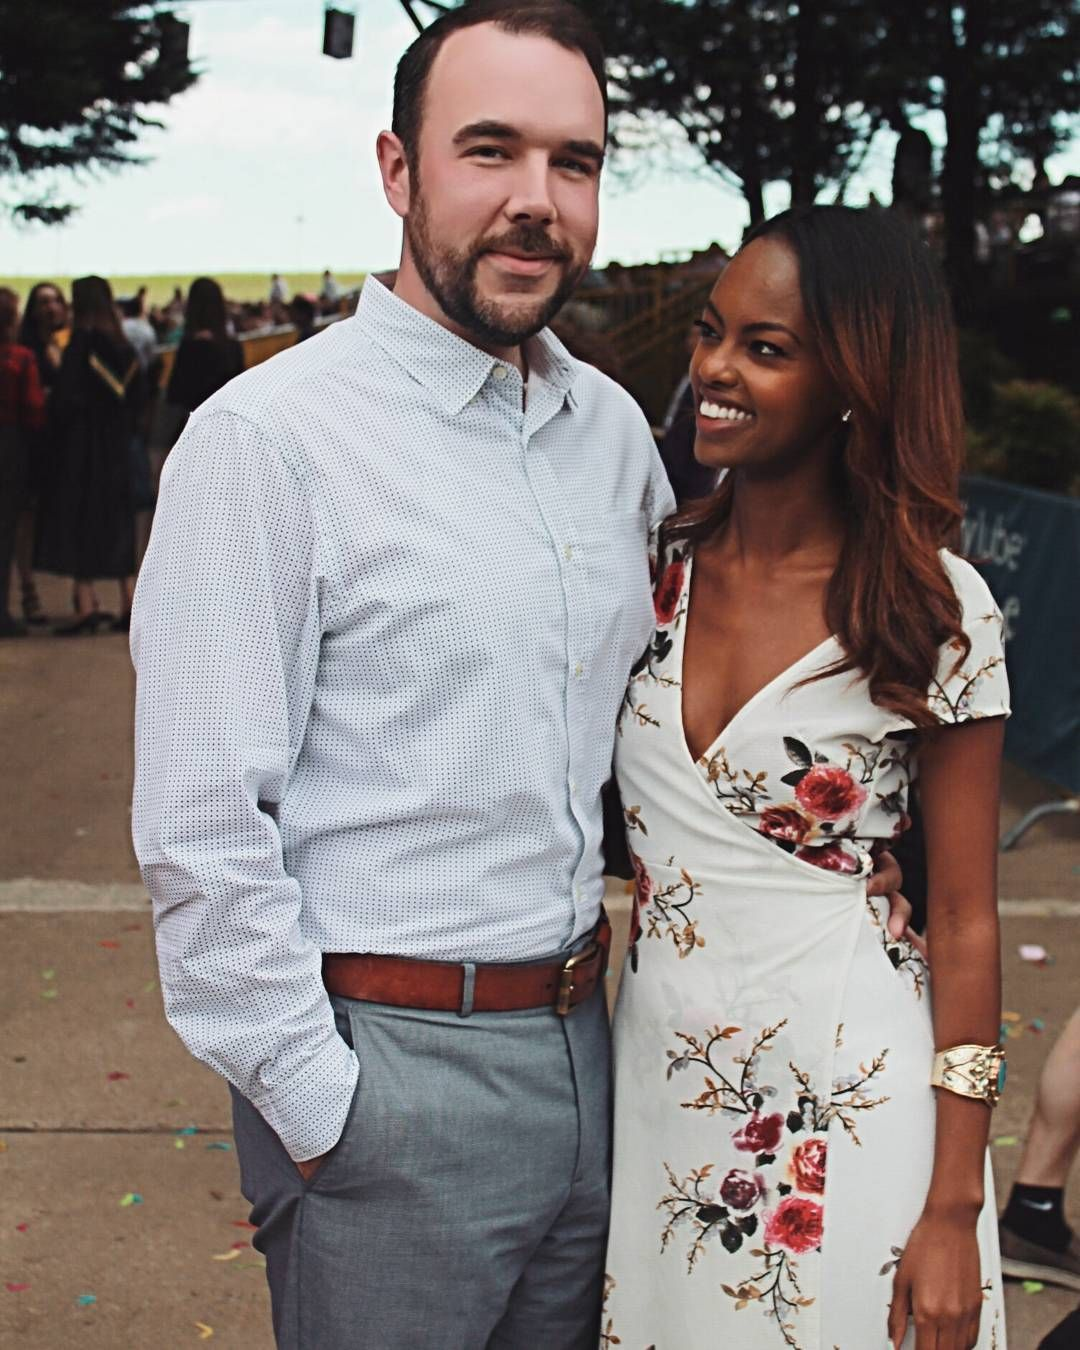 Interracial dating wmbw Monkey Bar hastighet dating